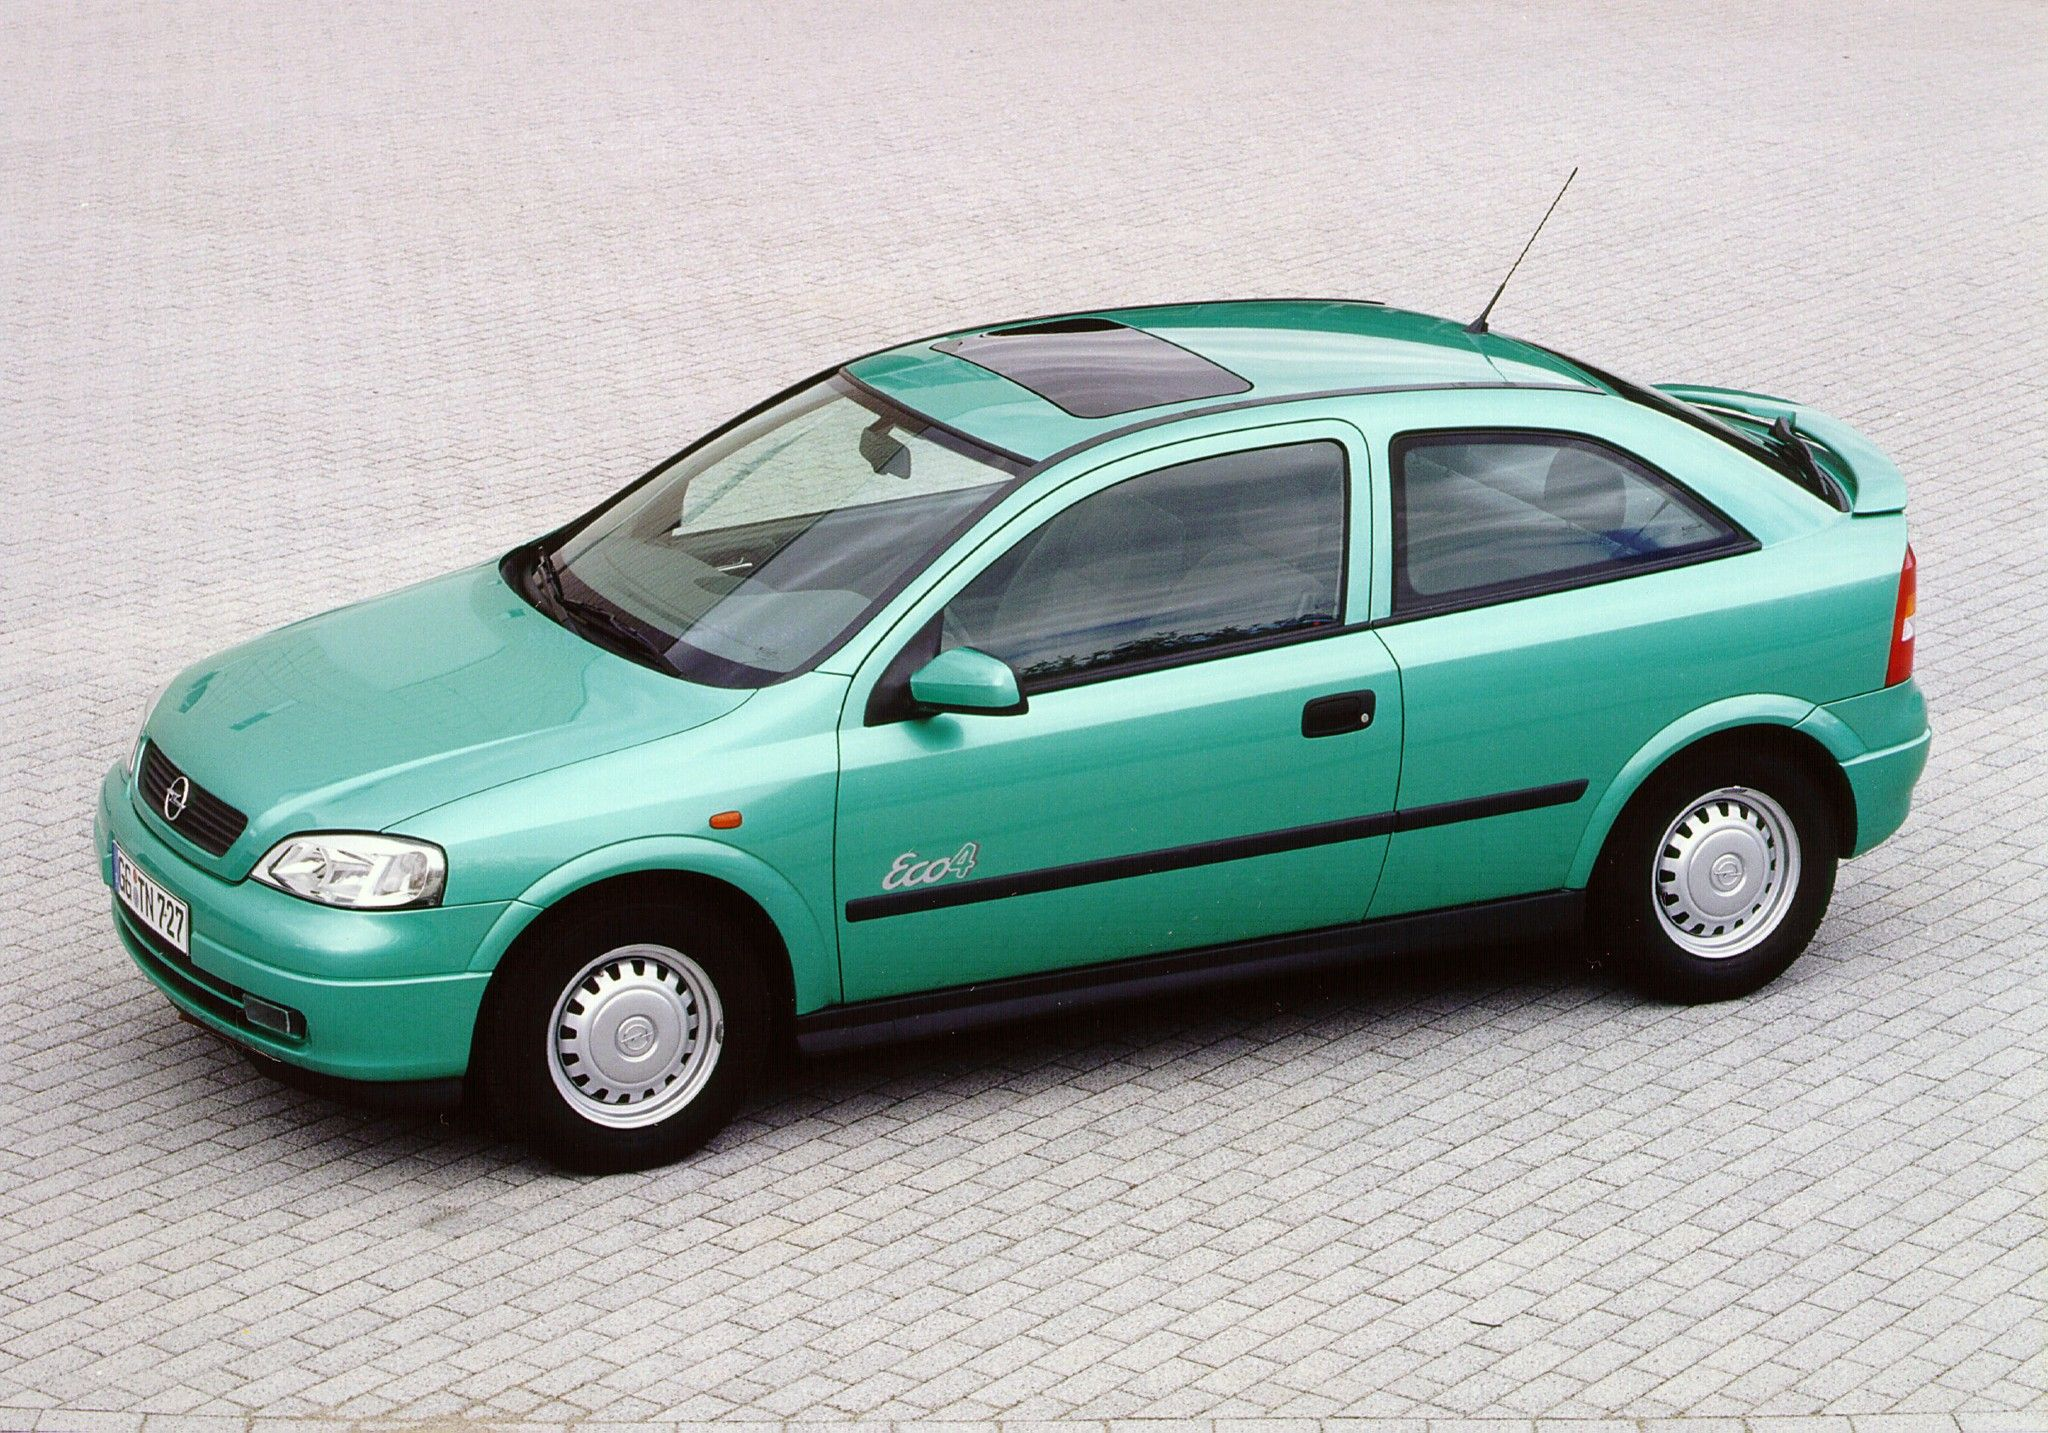 Opel Astra Eco4 G 07 2000 02 2004 Opel Astra Oldtimer